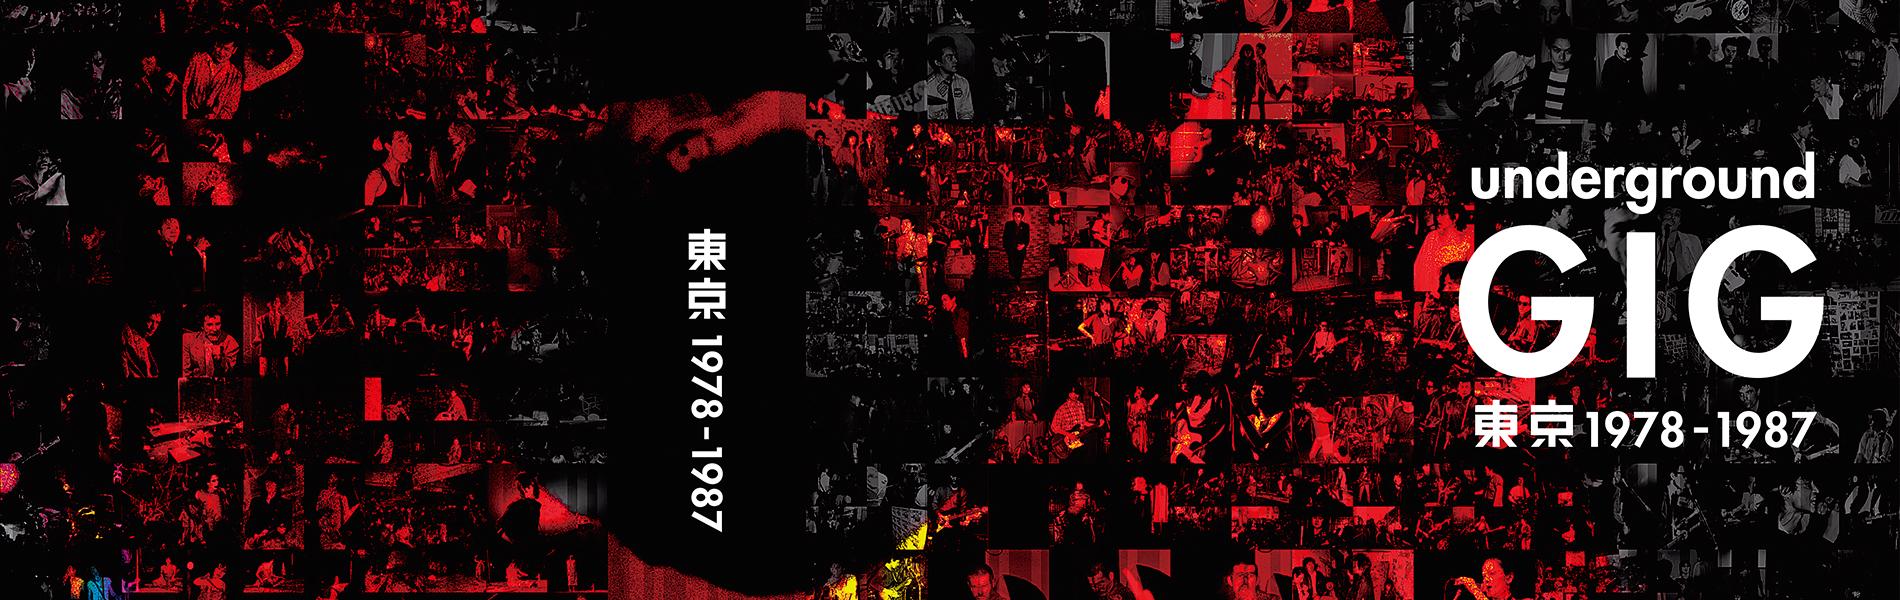 underground GIG 東京1978-1987